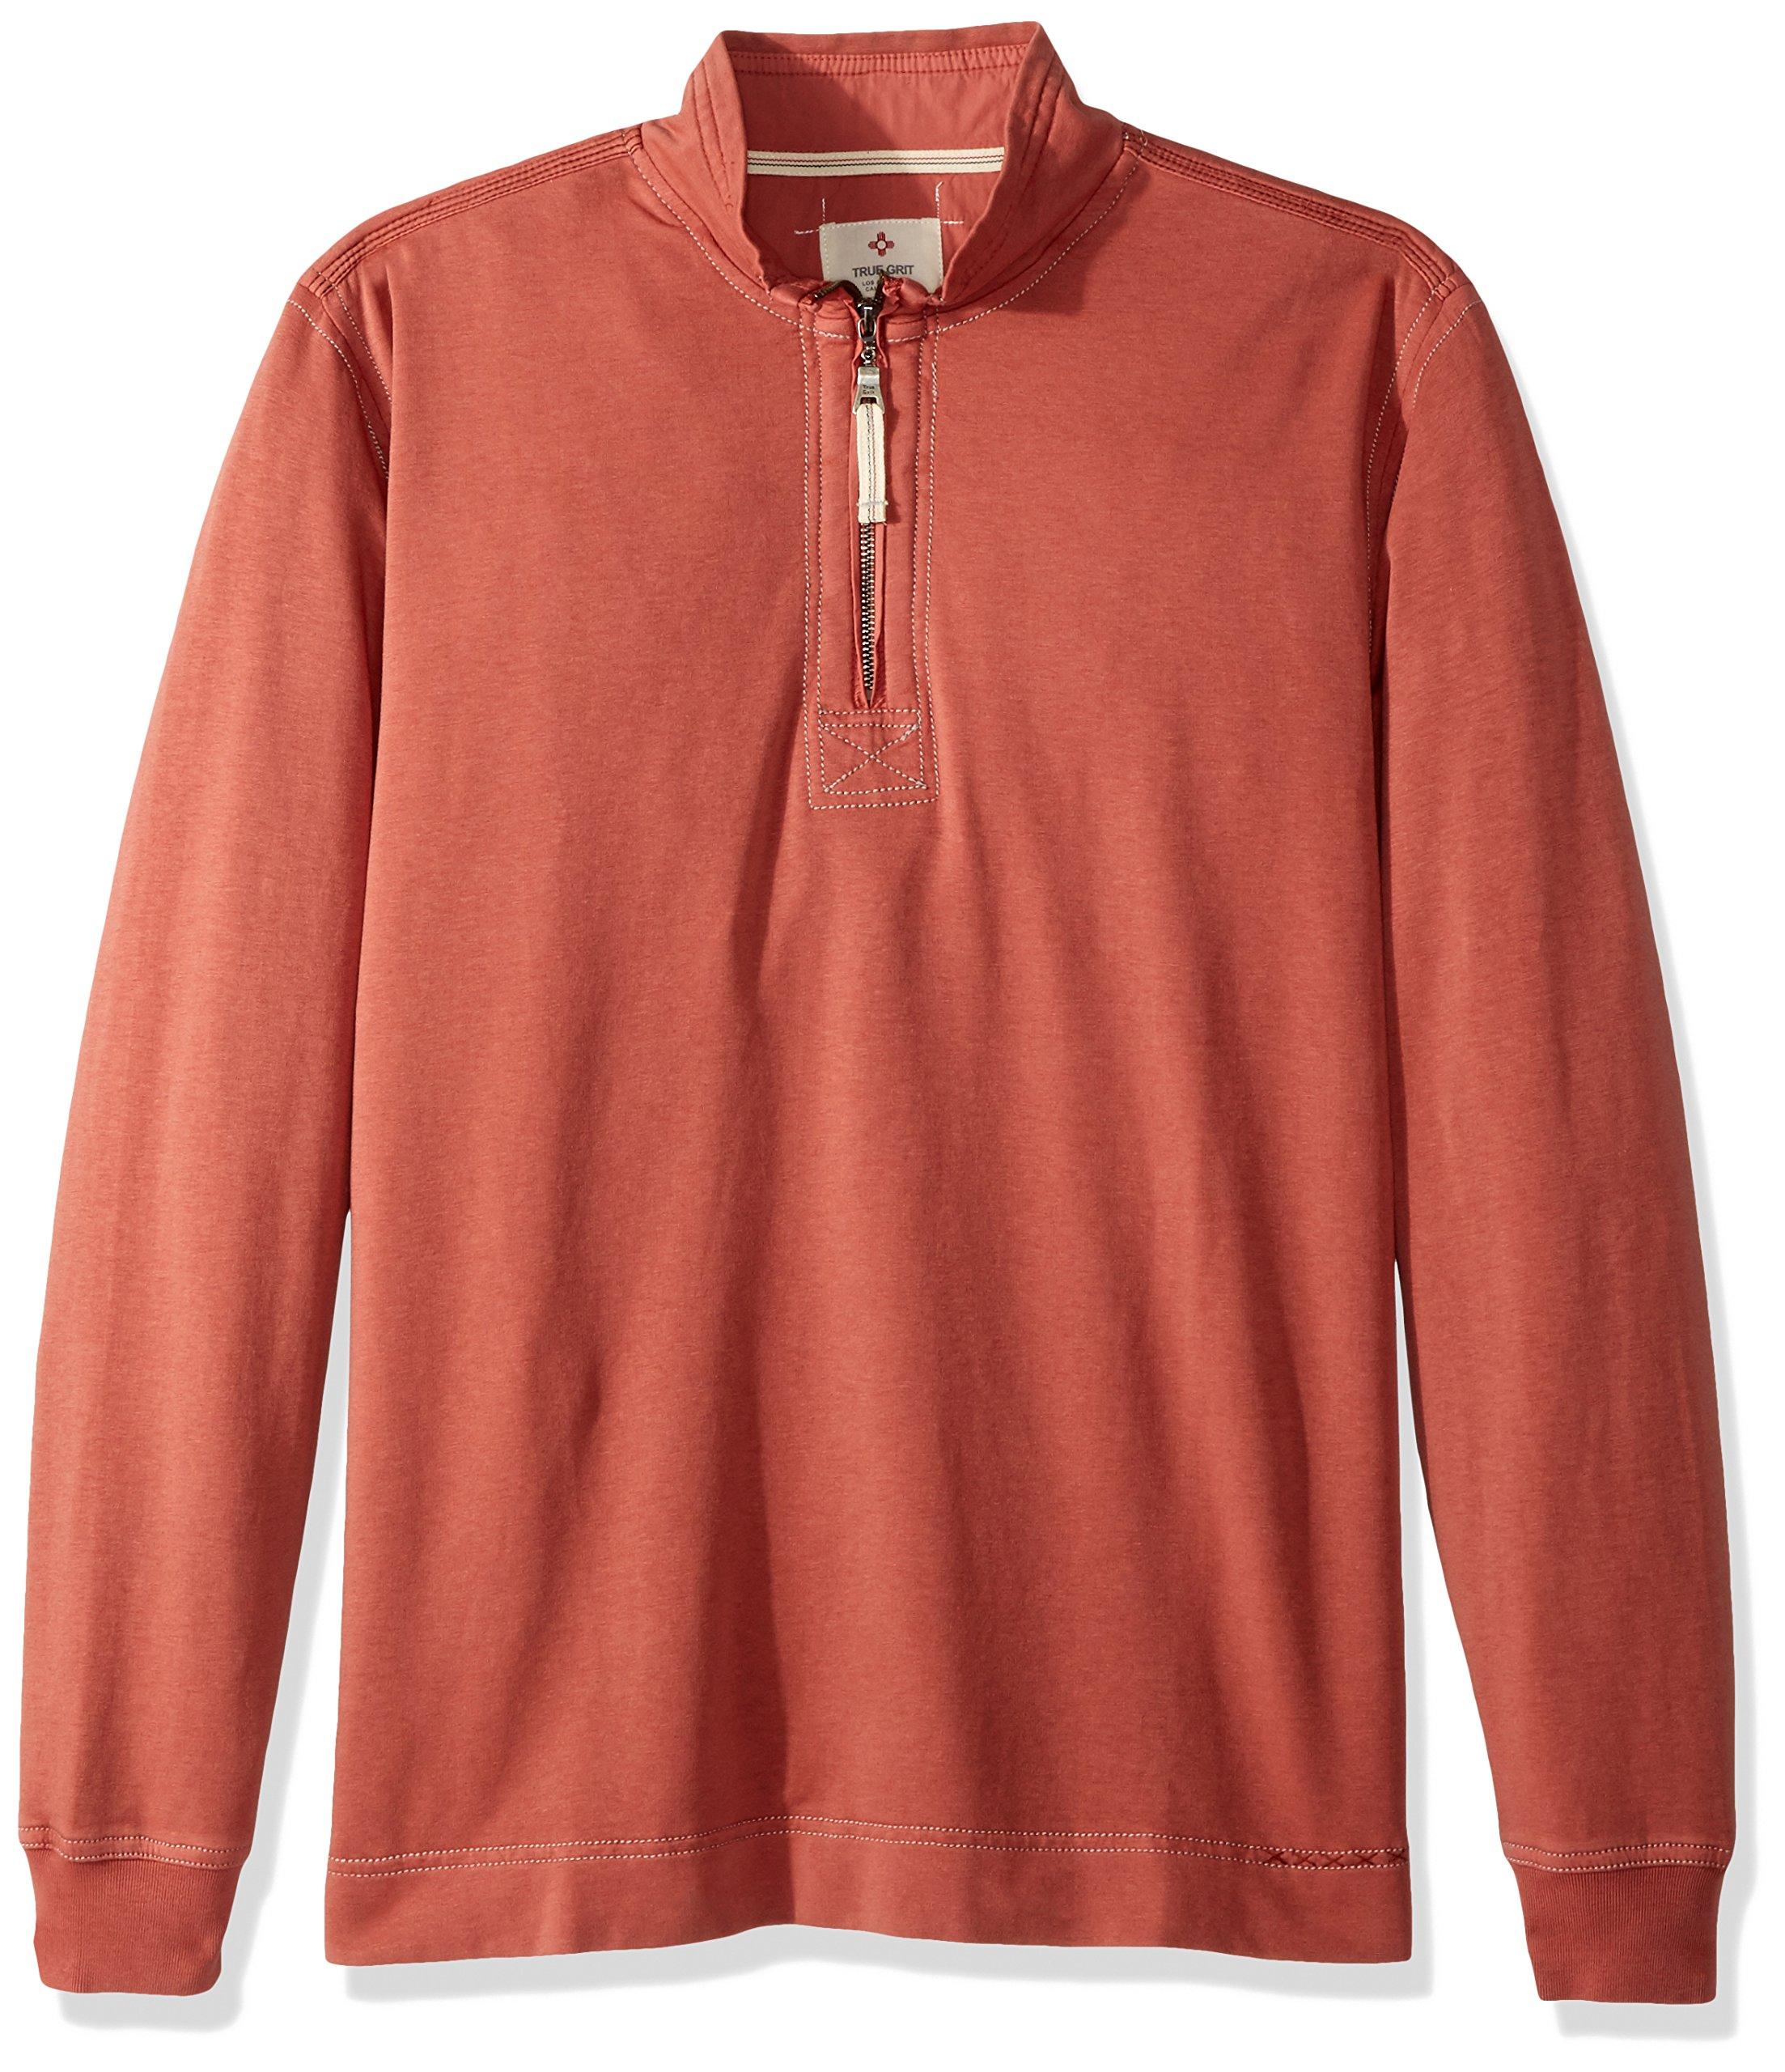 True Grit Men's Cotton Washed Heather Fleece Pullovers with Stitch Details, Brick/Zip Pullover, XXL